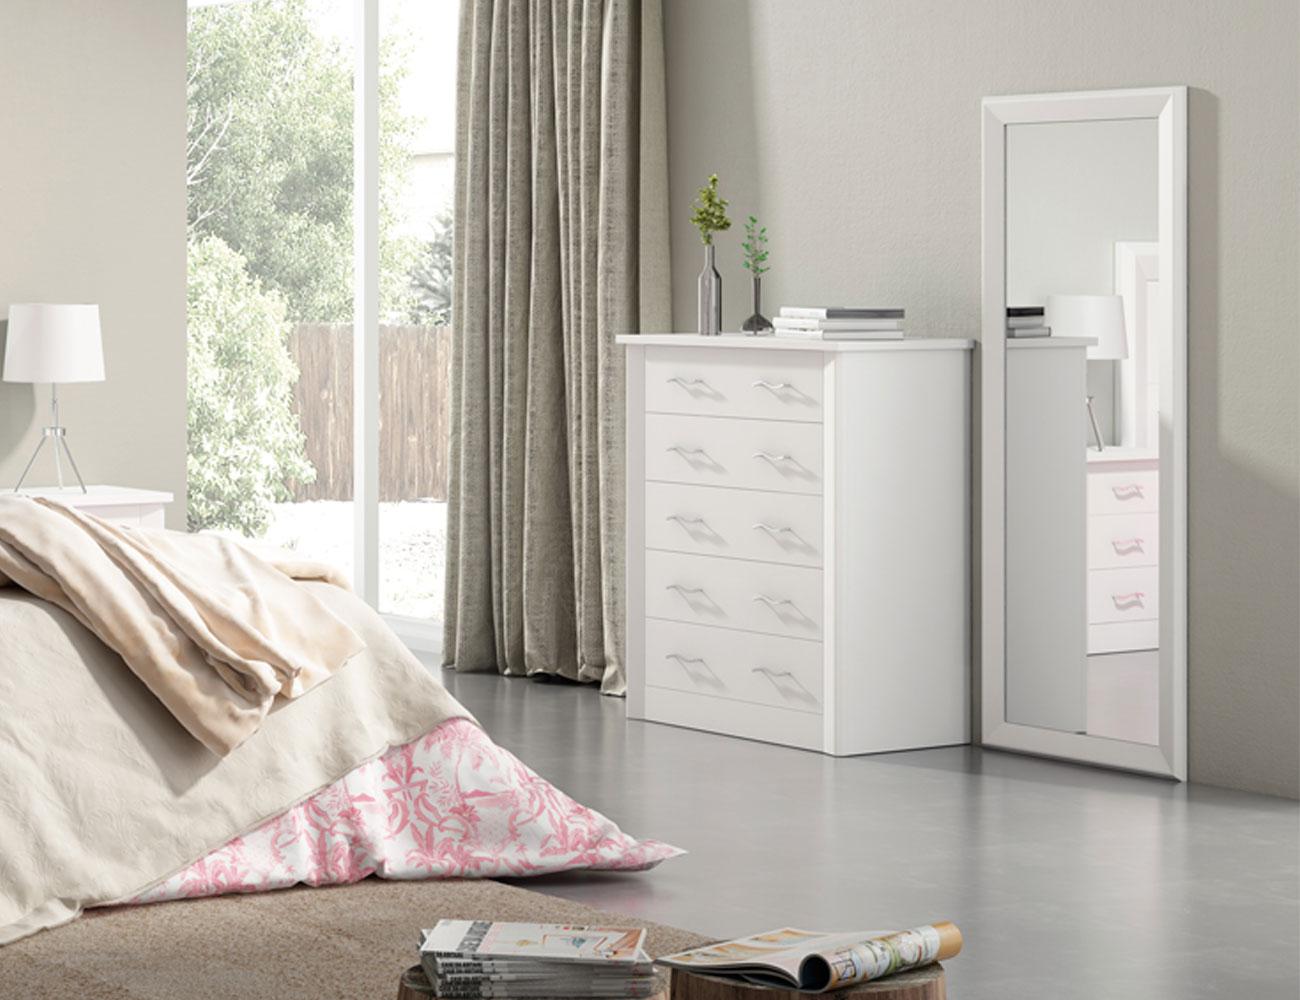 Dormitorio de matrimonio en madera con cabecero tapizado - Cabecero tapizado blanco ...